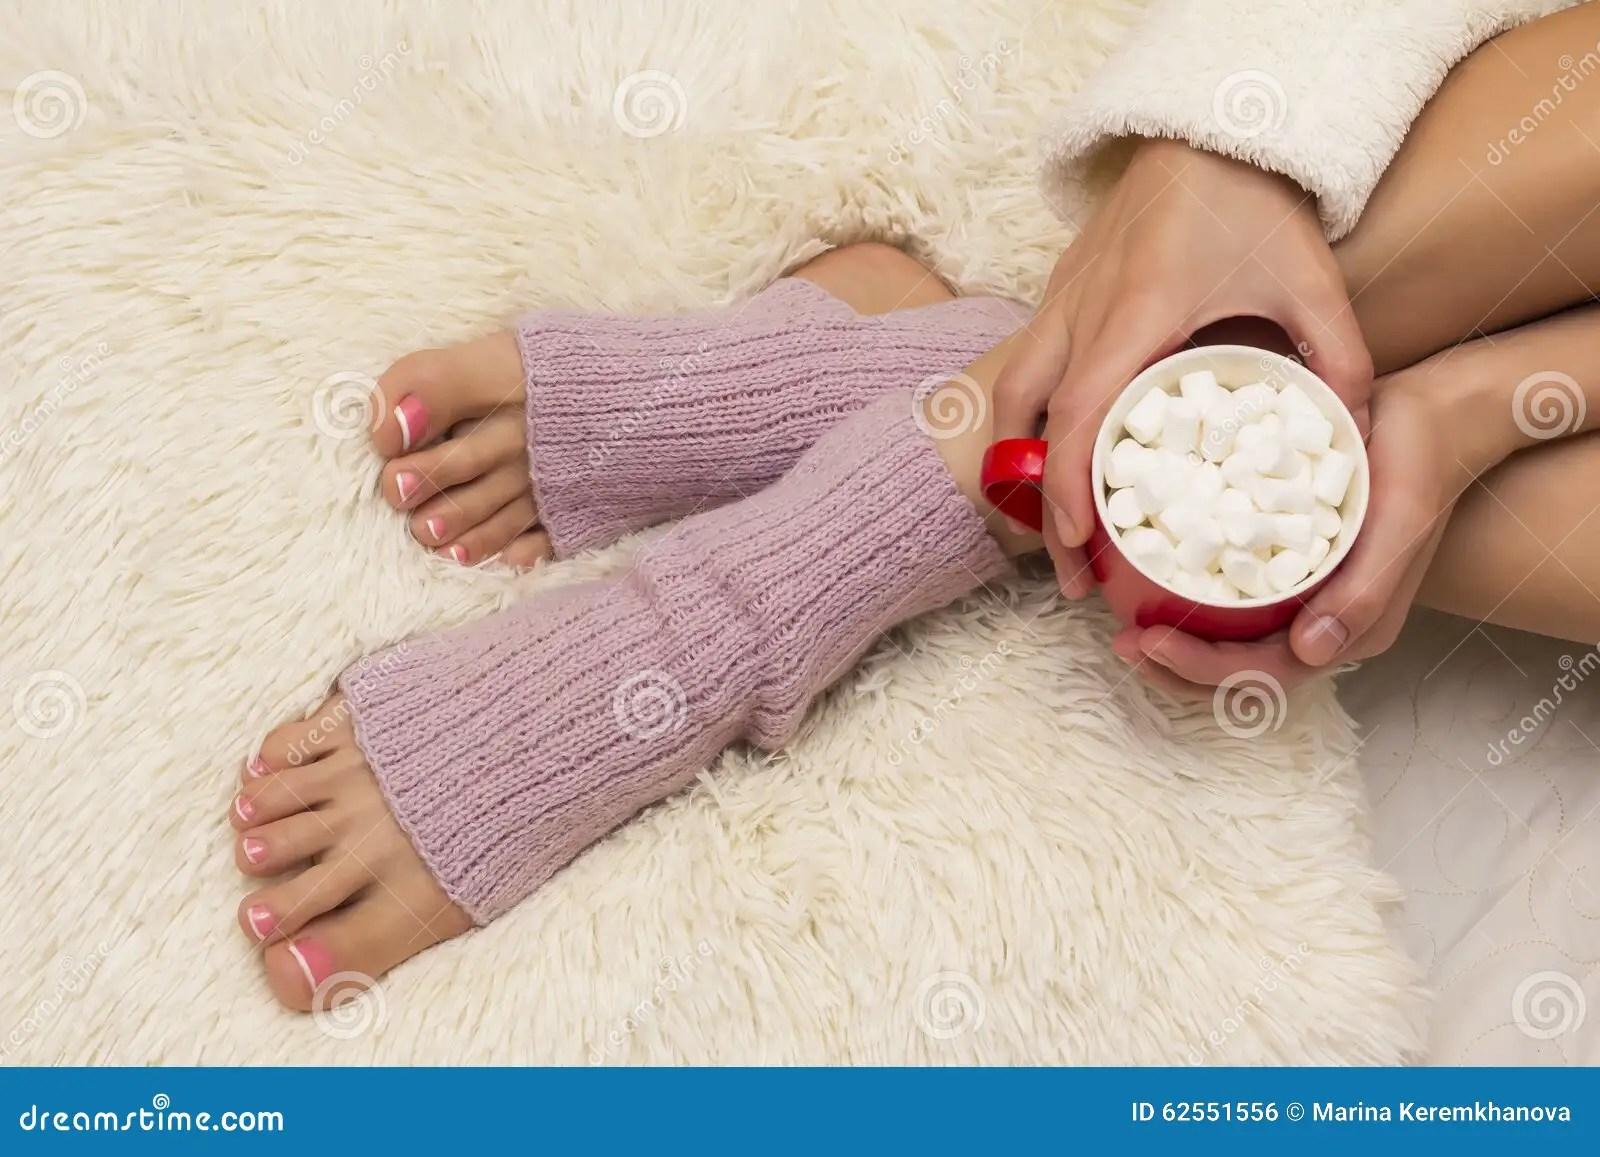 Homeliness Stock Photo. Image Of White, Marshmallow